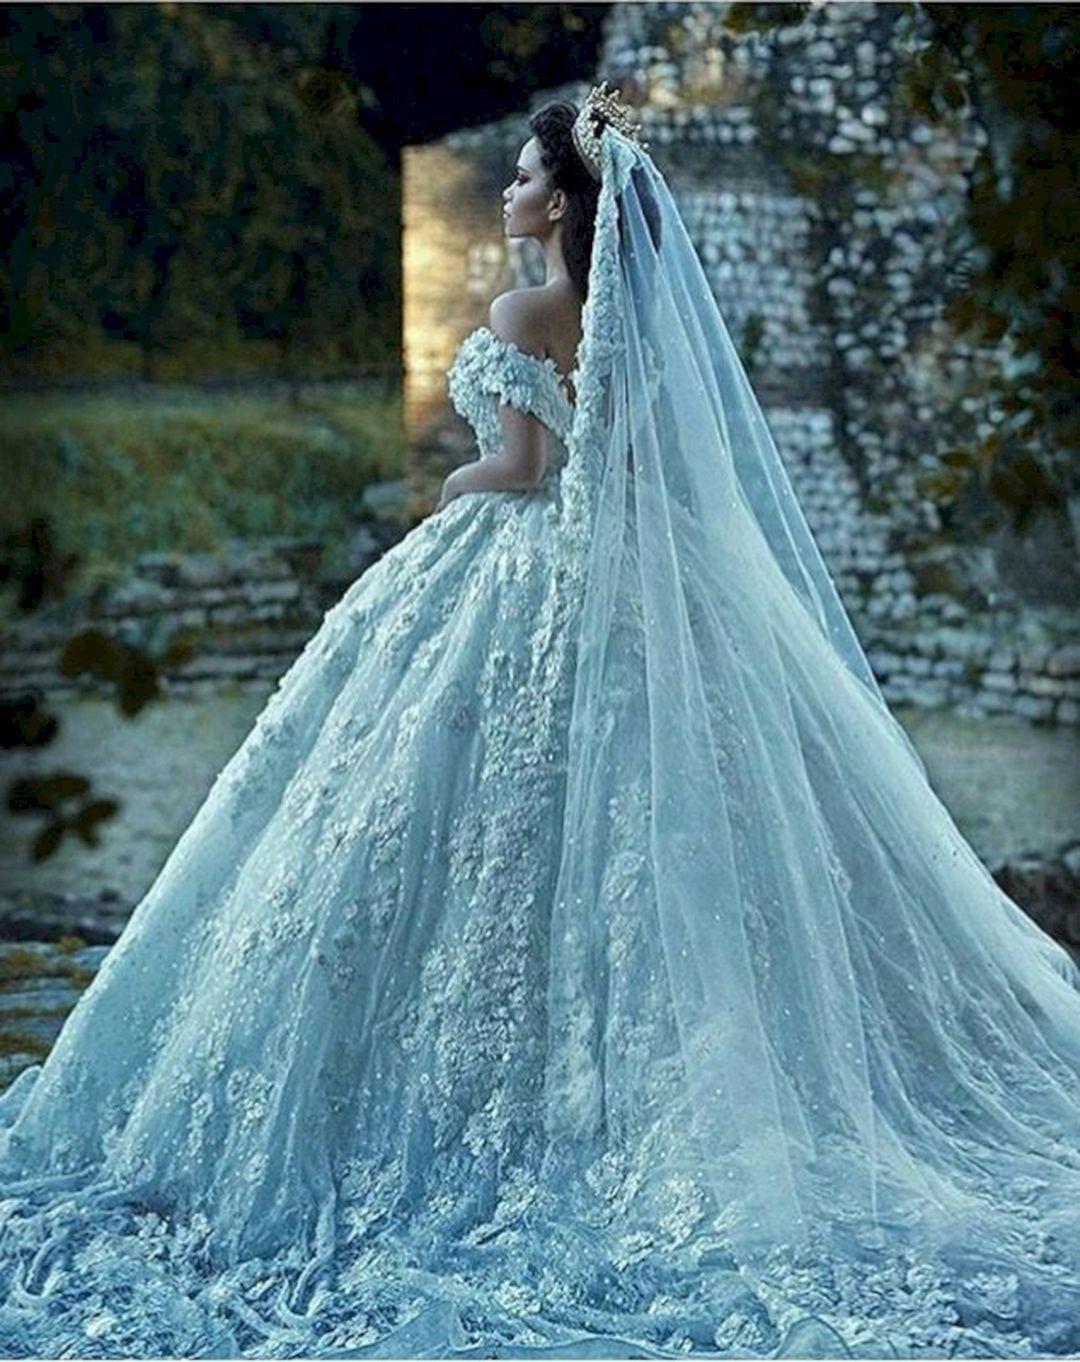 20 Marvelous Blue Wedding Dress That Look